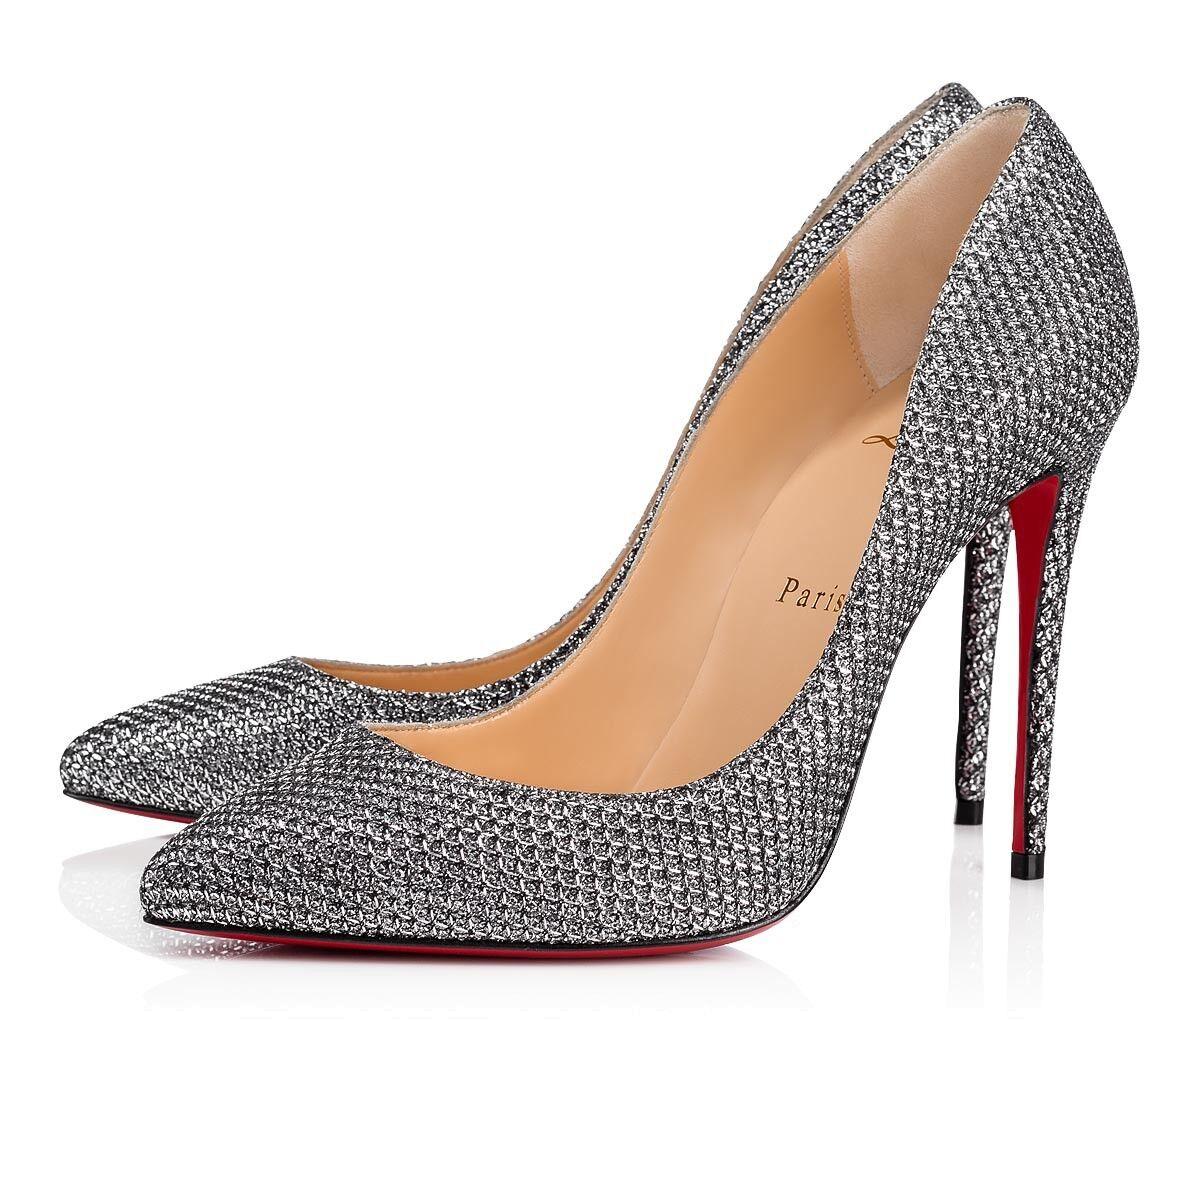 NIB Christian Louboutin Pigalle Follies 100 Antic Silver Glitter Heel Pump 42